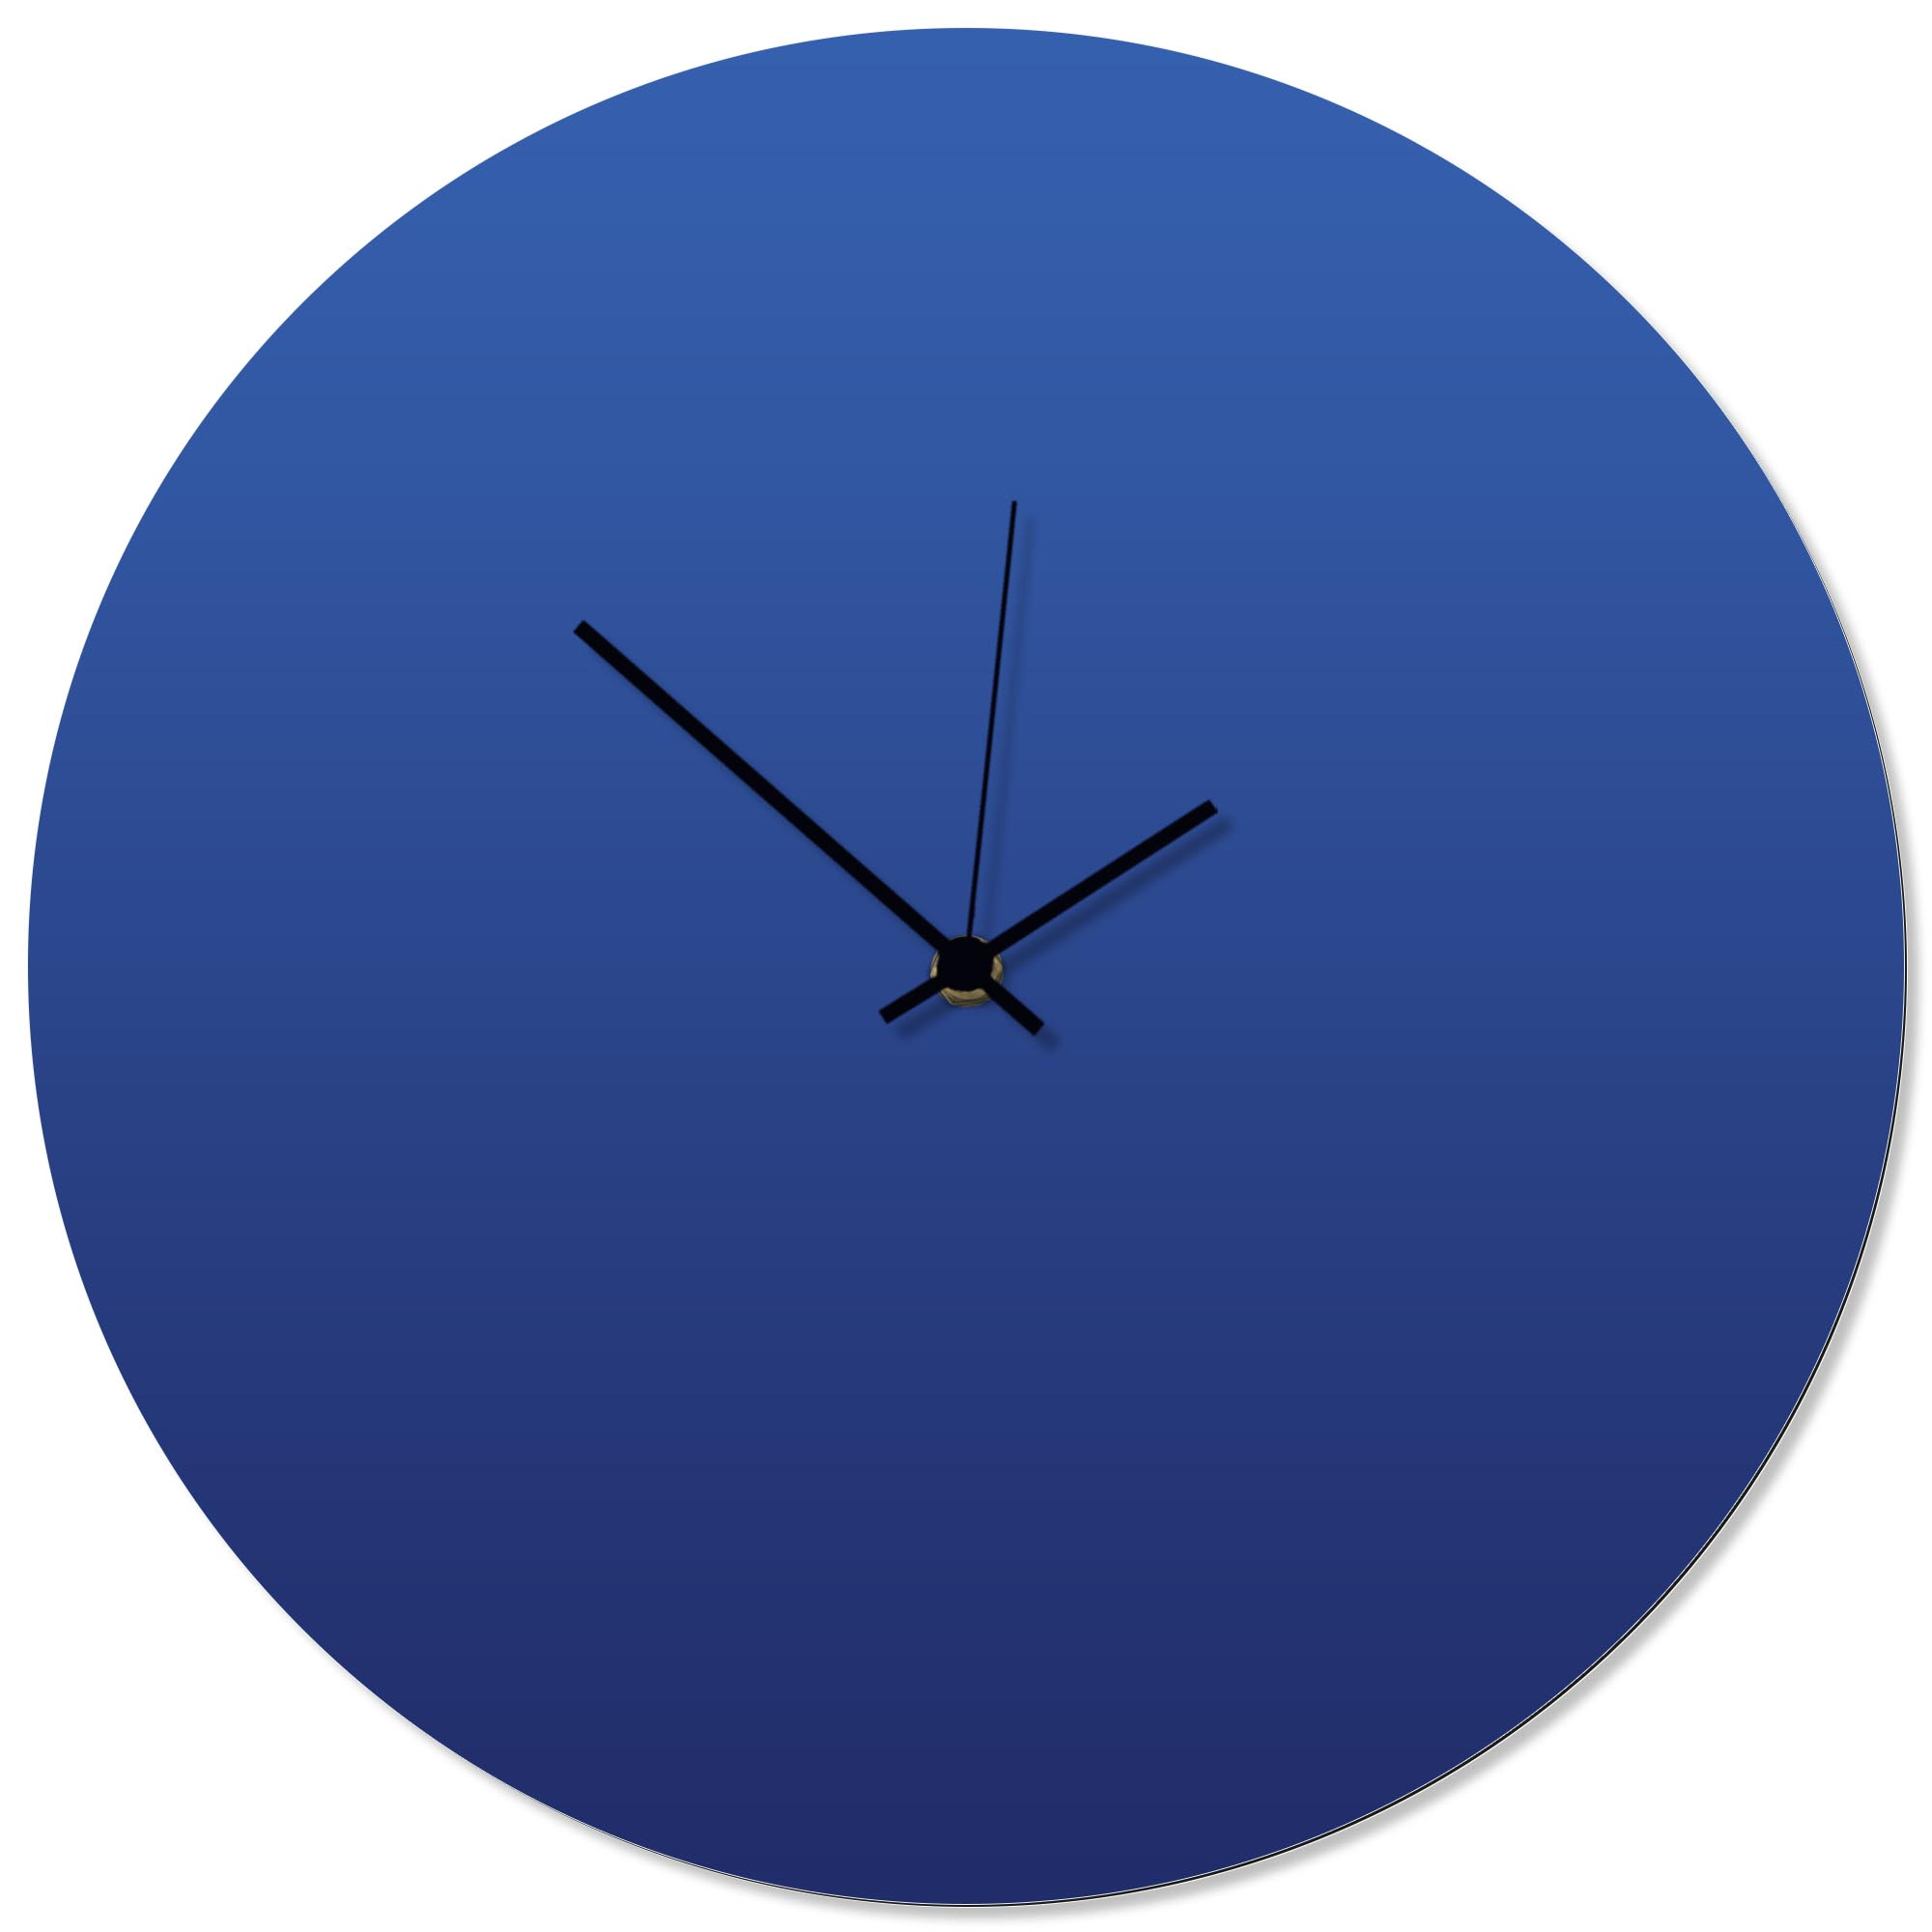 Blueout Black Circle Clock 16x16in. Aluminum Polymetal